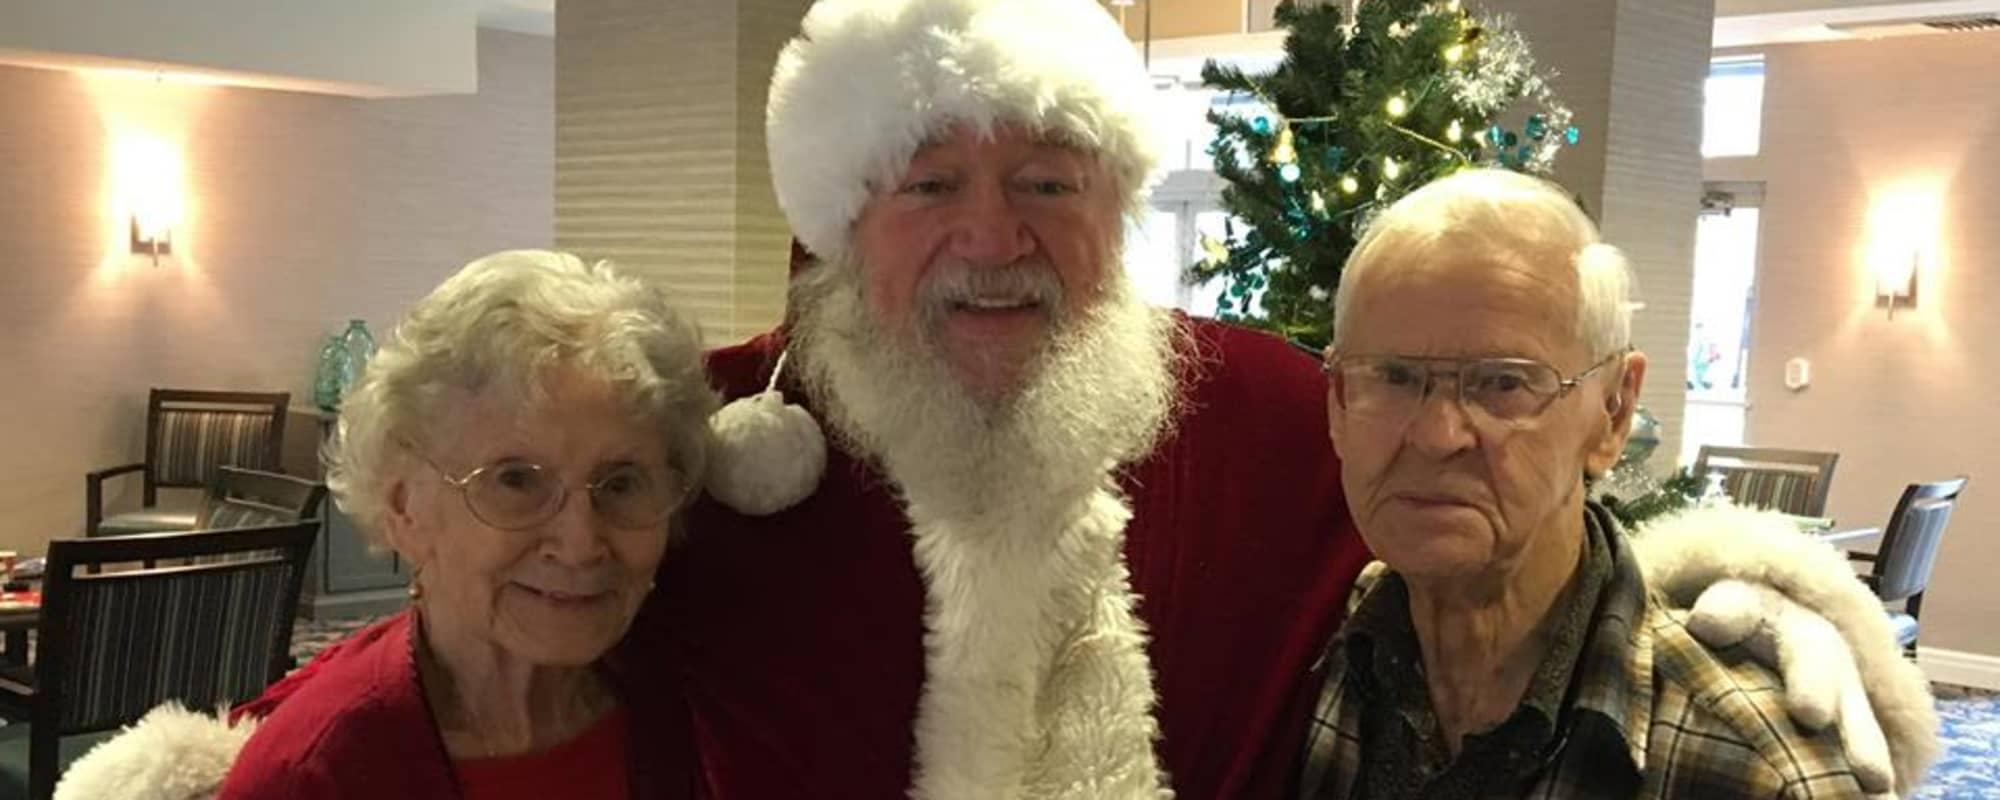 Meet Santa at Northgate Plaza in Seattle, Washington